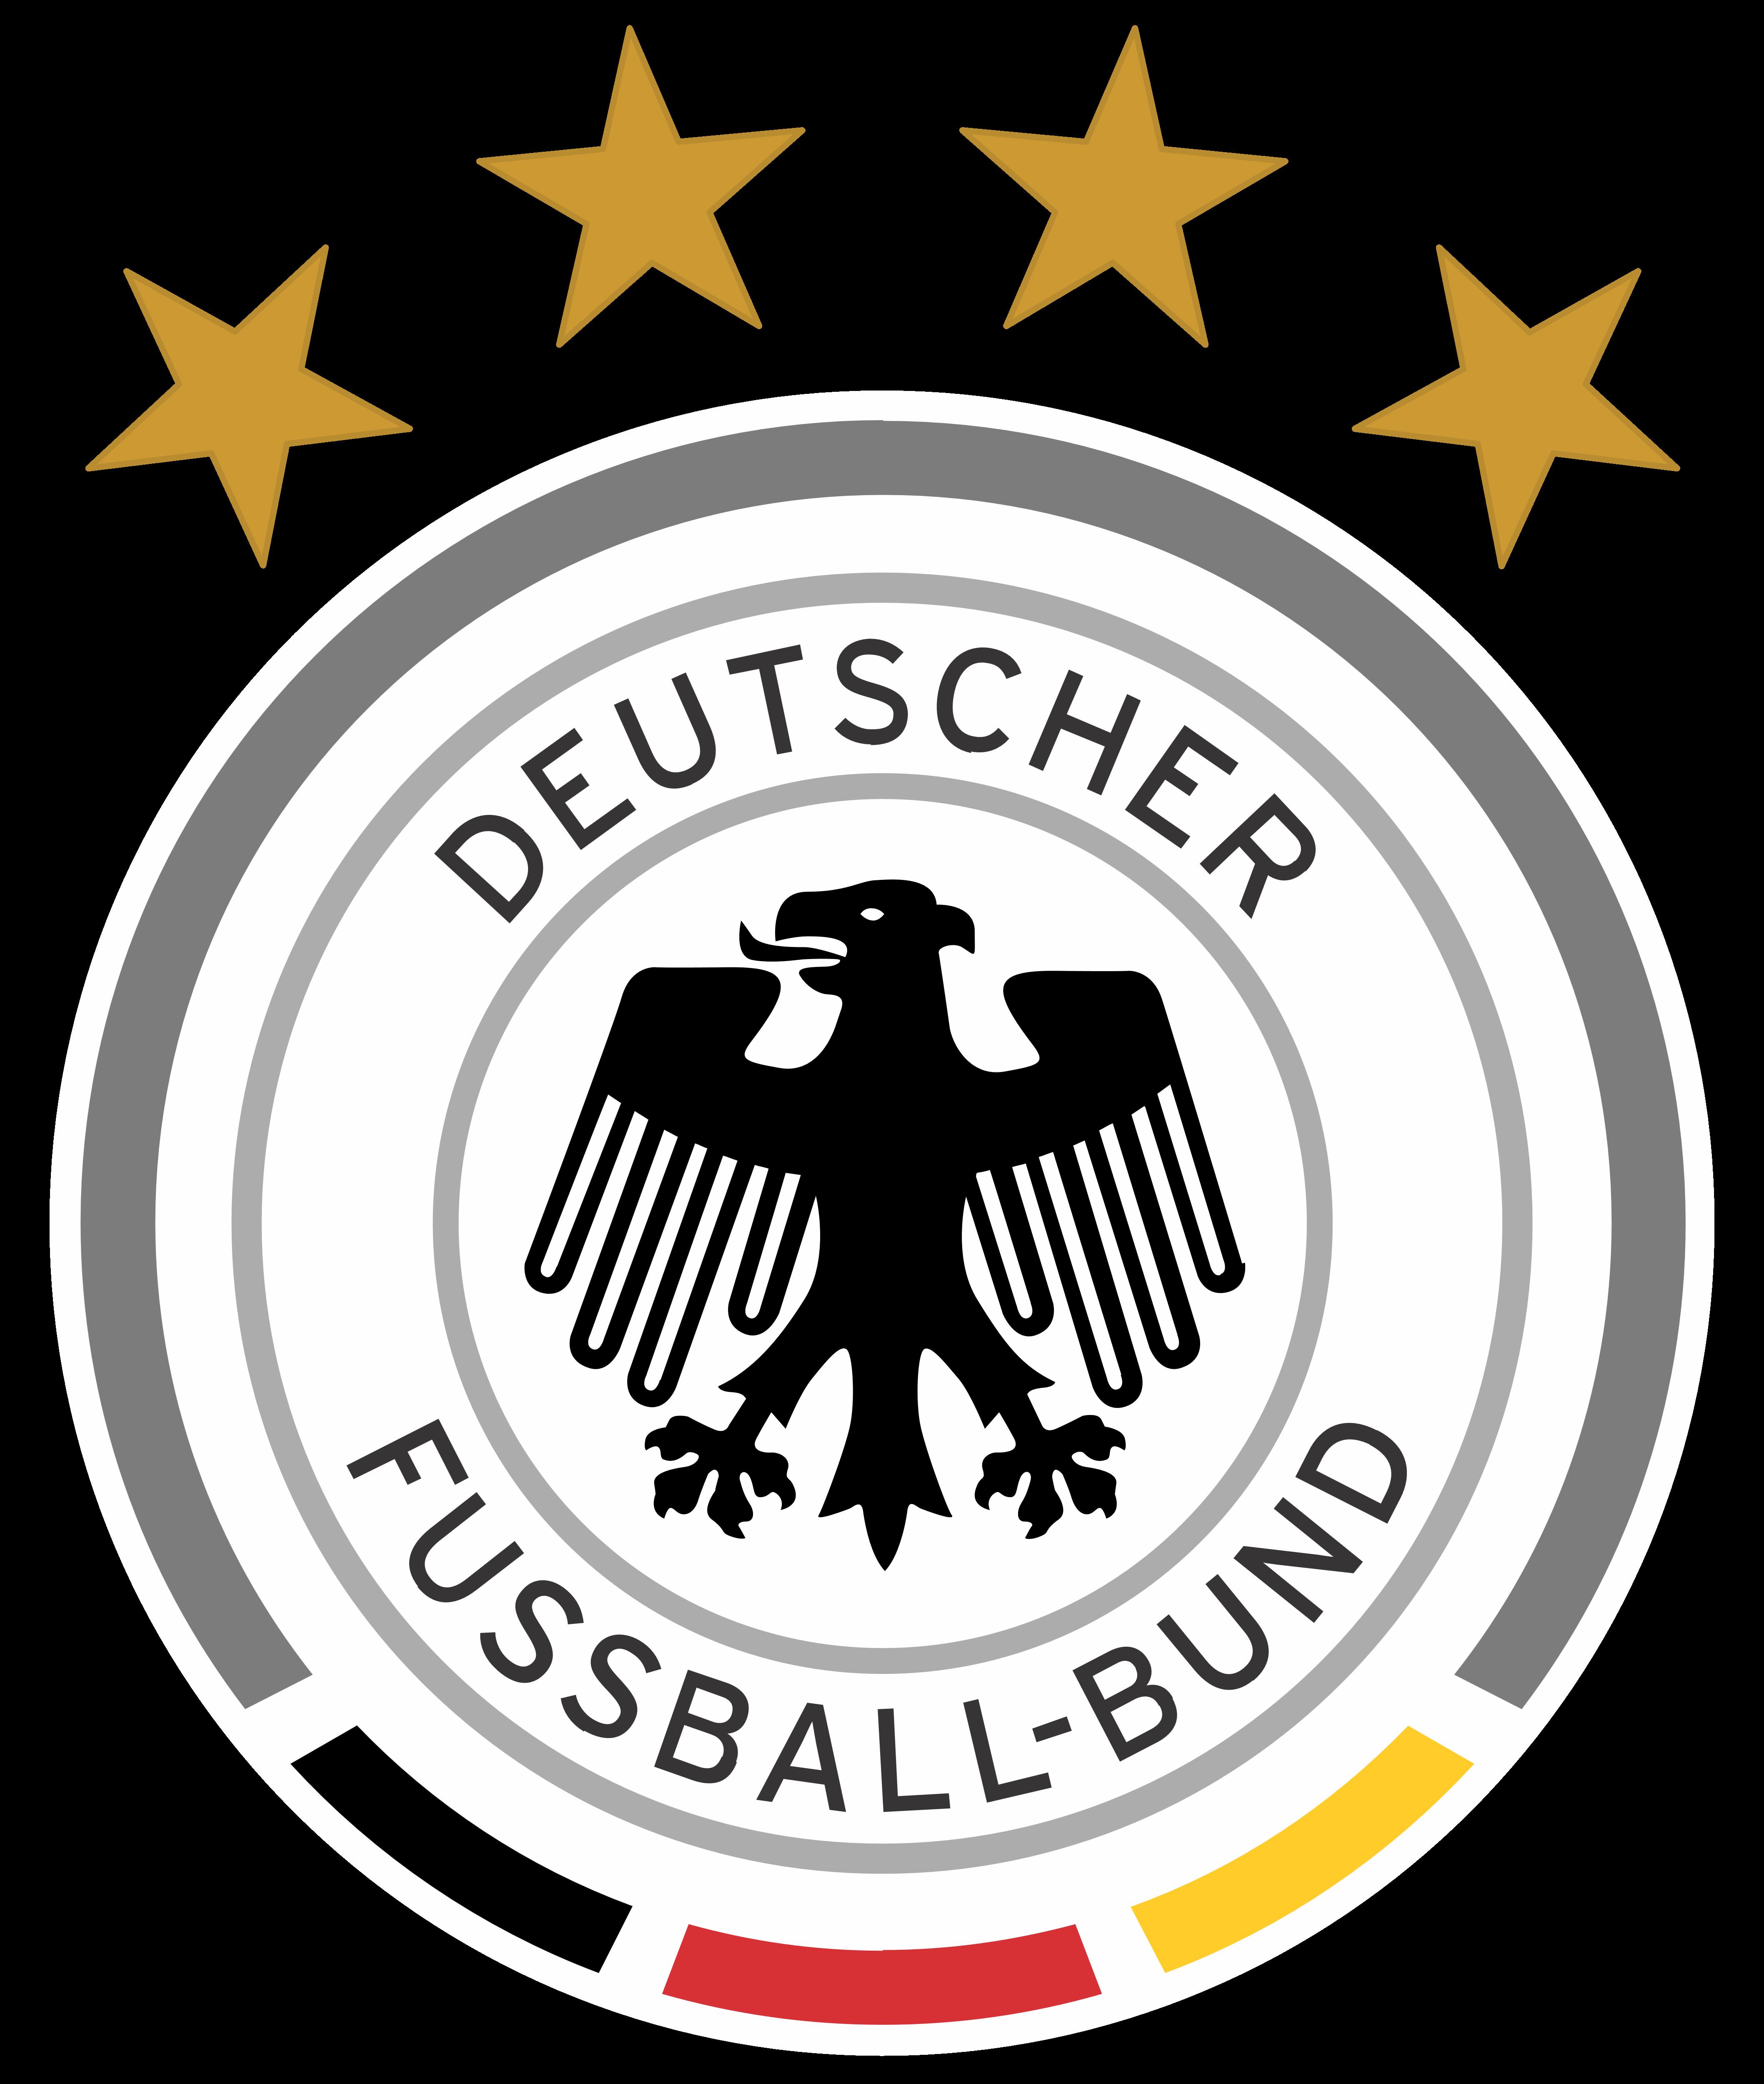 Germany National Football Team Logo Deutscher Fussball Bund Logos Download